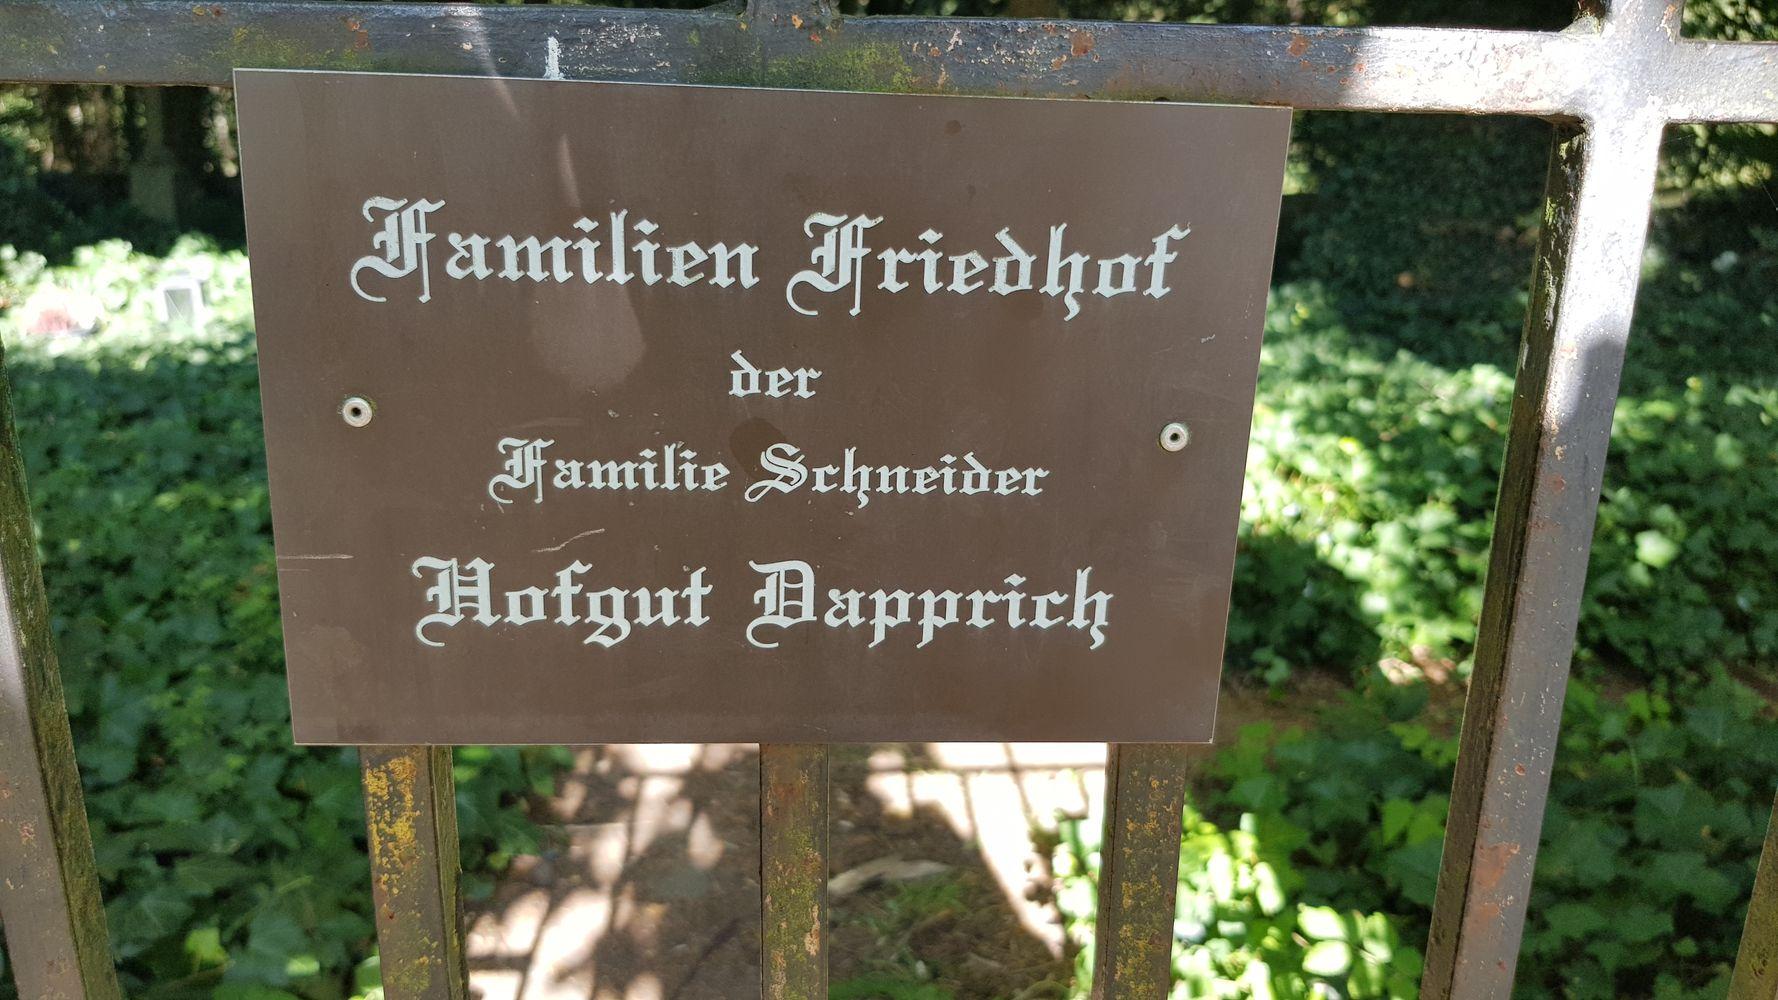 Der Familienfriedhof der Familie Schneider am Hofgut Dapprich